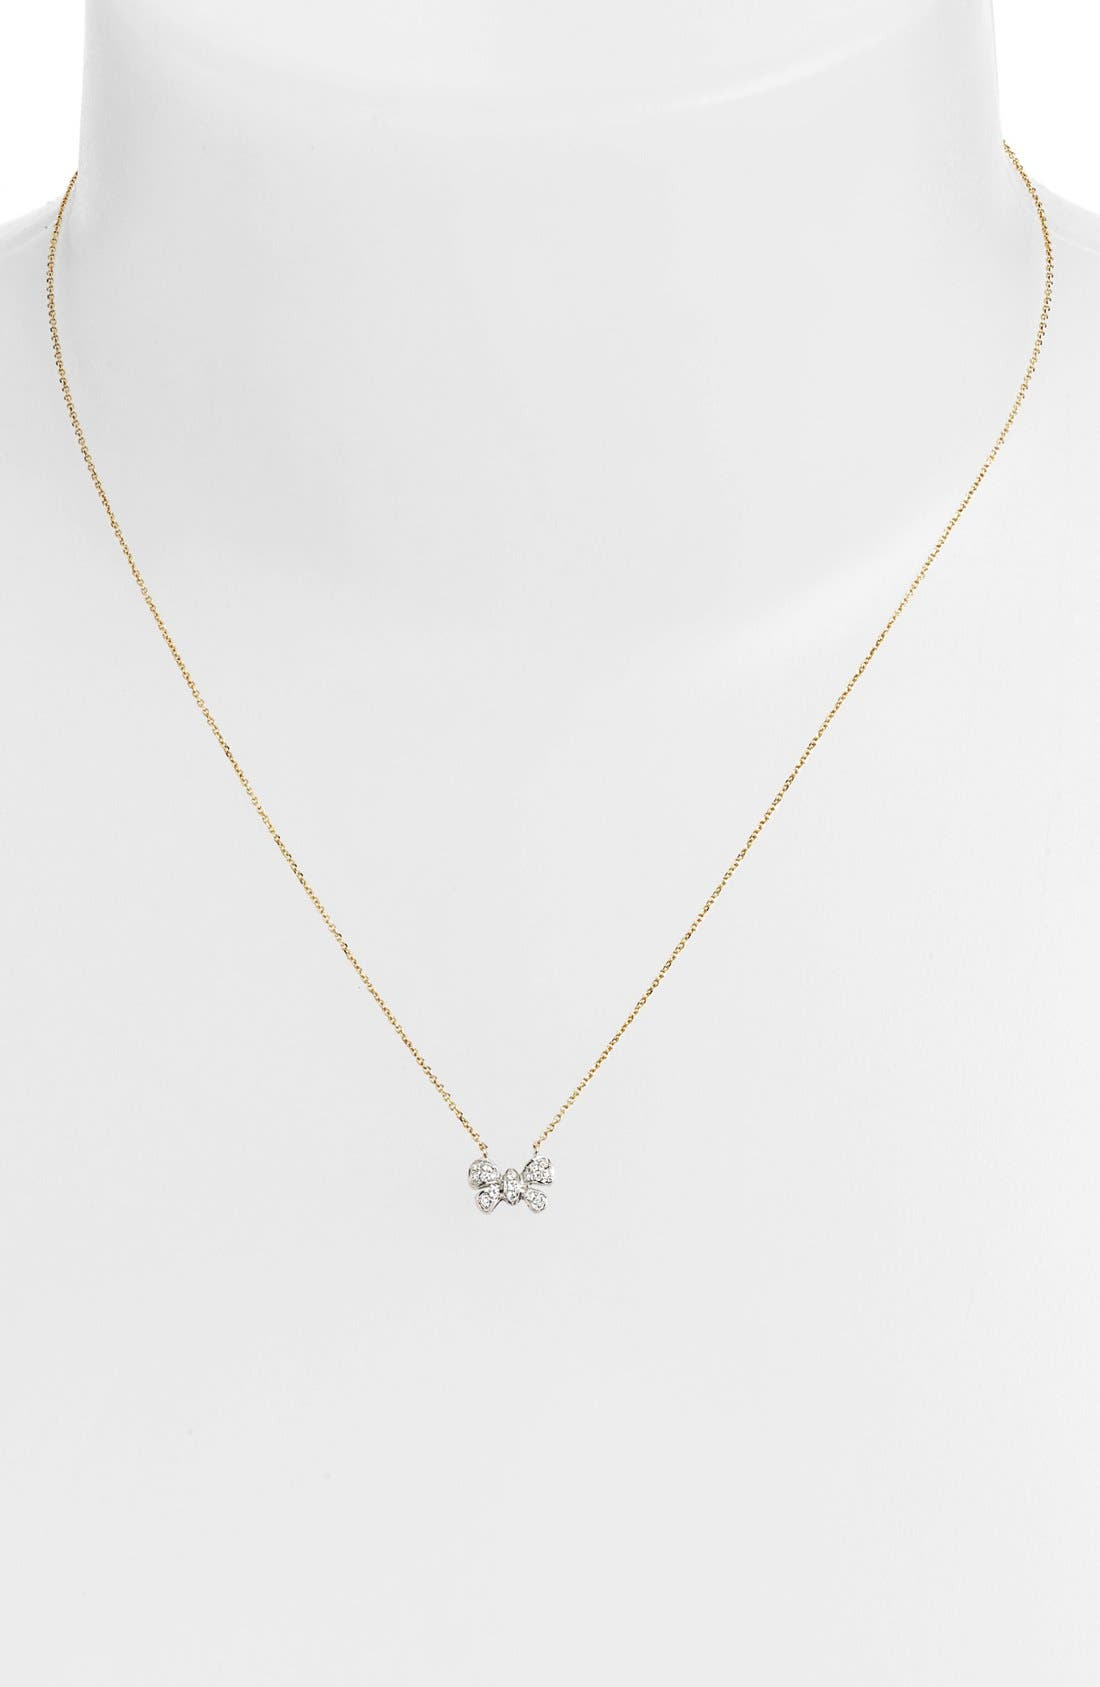 Main Image - Dana Rebecca Designs 'Margo Ashley' Diamond Bow Pendant Necklace